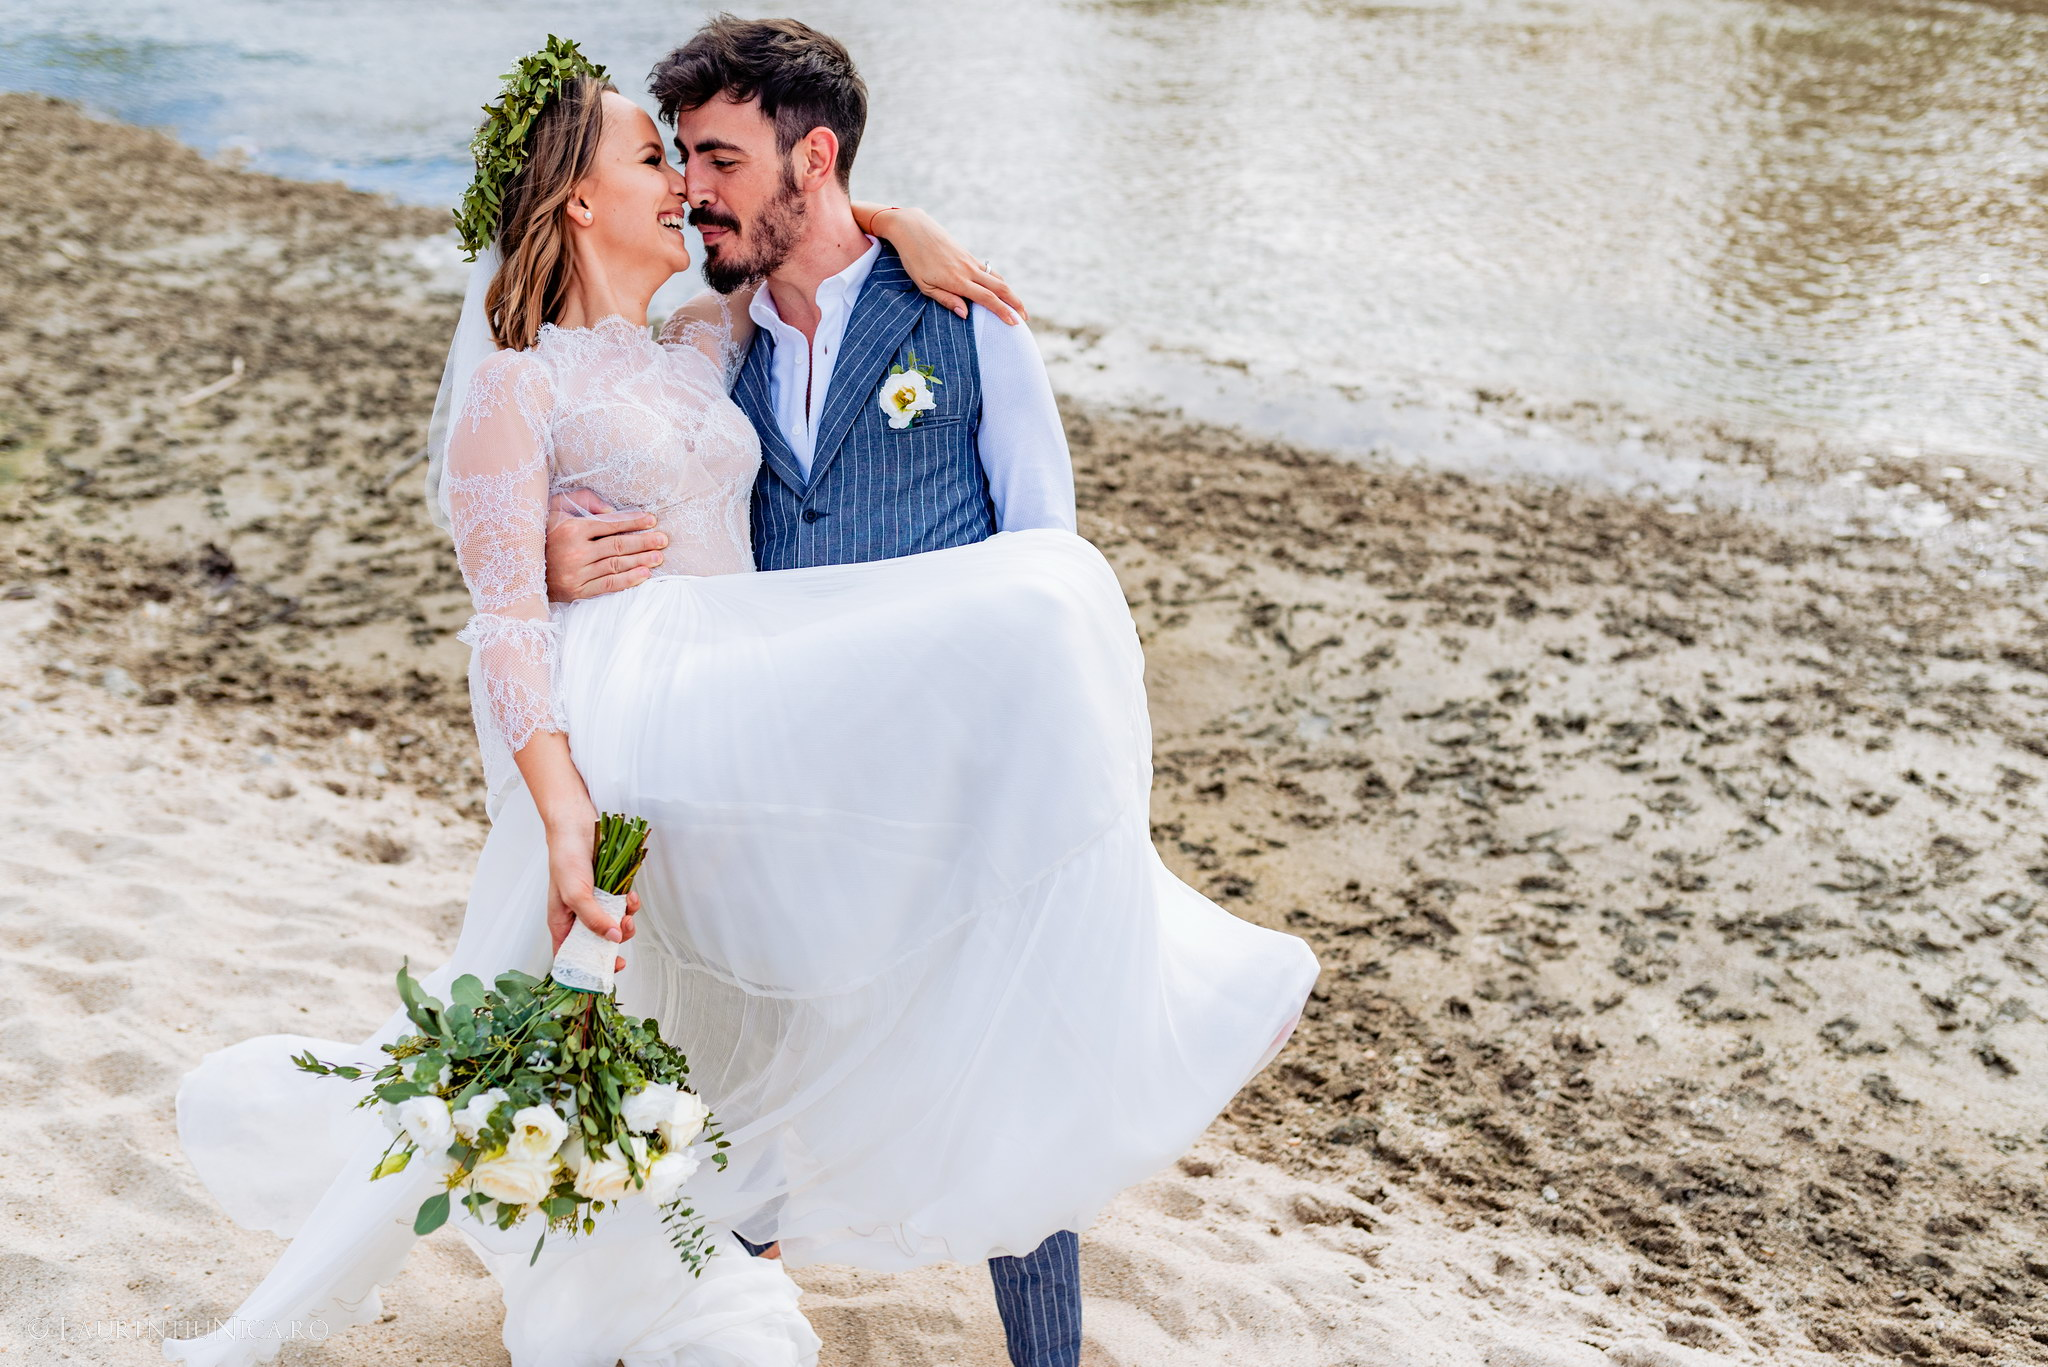 20180915 LN 0625 - Diana & Marius | Fotografii nunta | Slatina